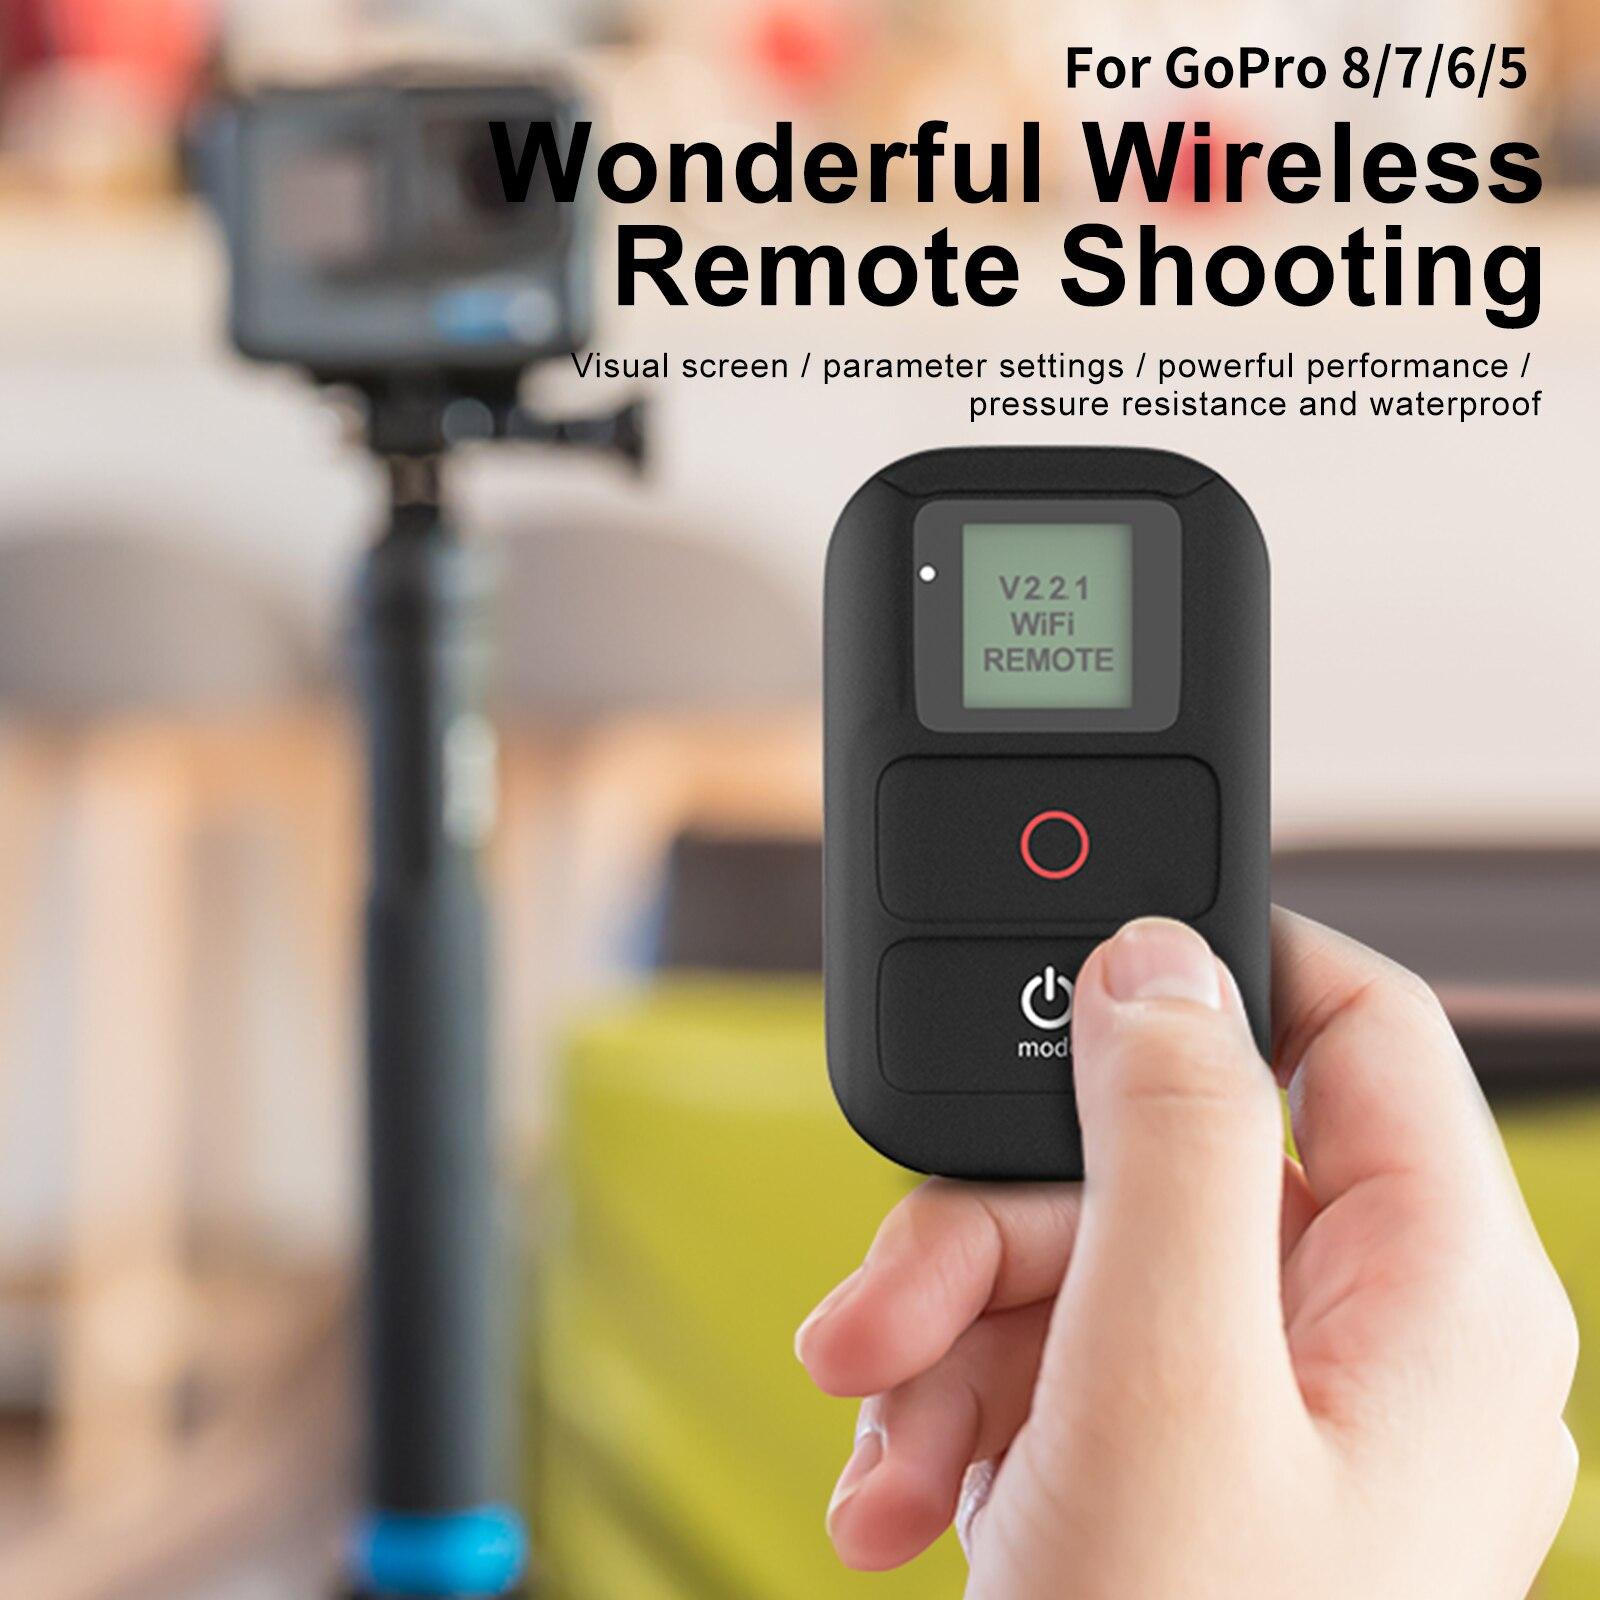 TELESIN WiFi جهاز التحكم عن بعد هو مناسبة ل GoPro بطل 8 7 6 5 4 3 الأسود بطل 4 جلسة الرياضة كاميرا الملحقات ip54water